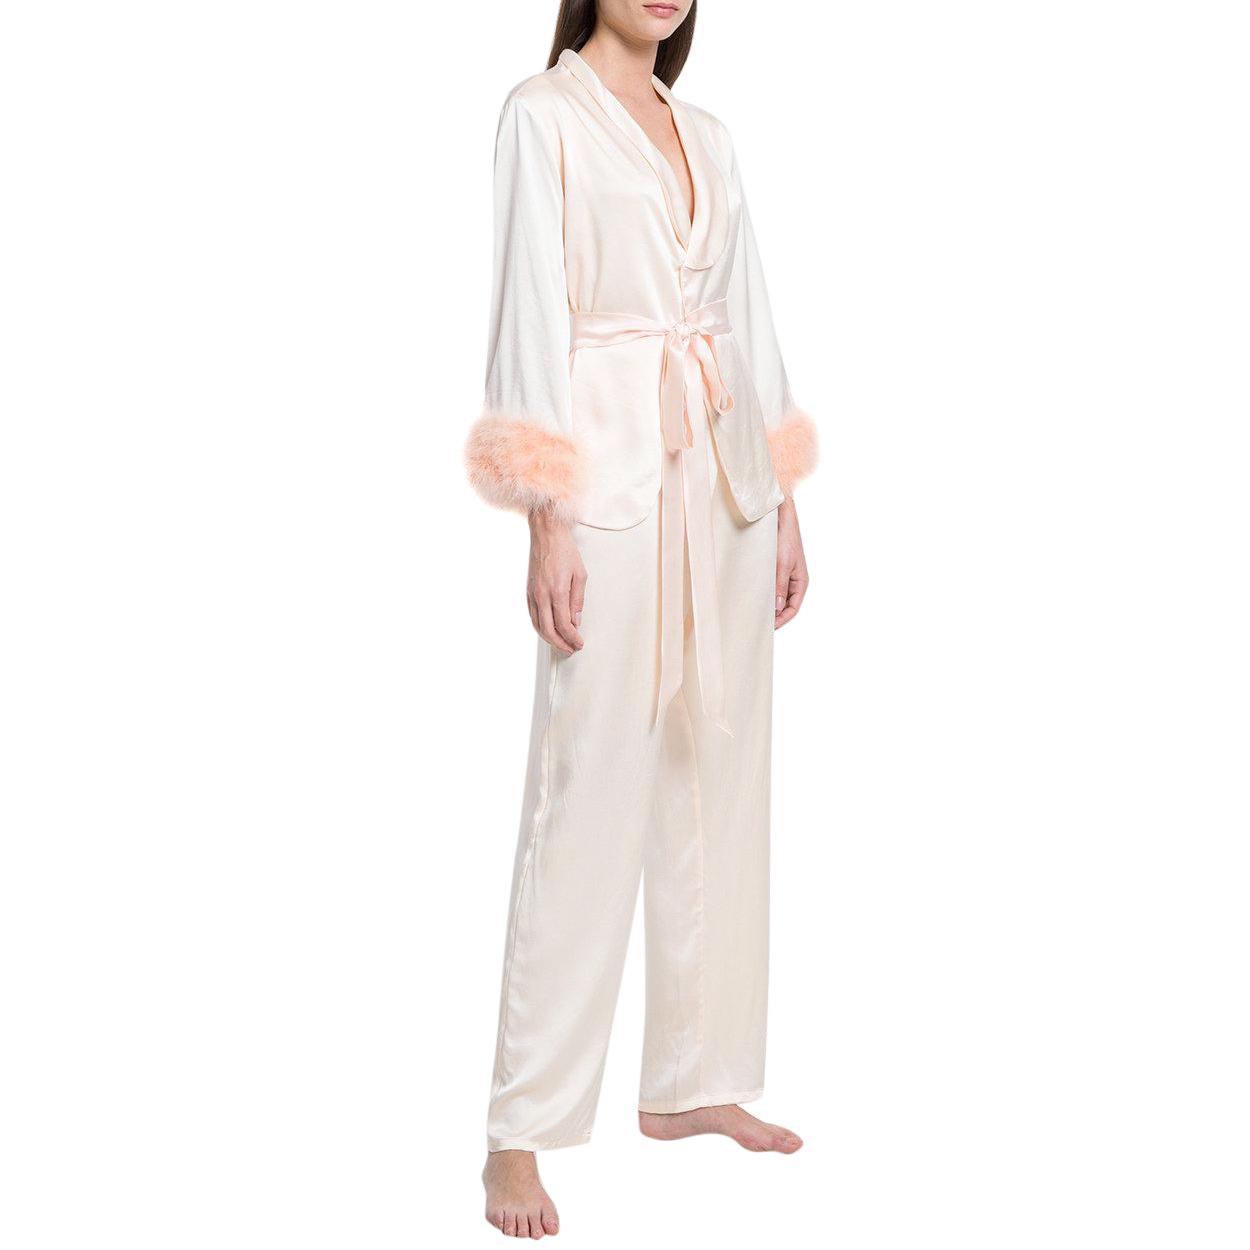 Maguy de Chadirac Peach Feather-Trimmed Pyjama Set